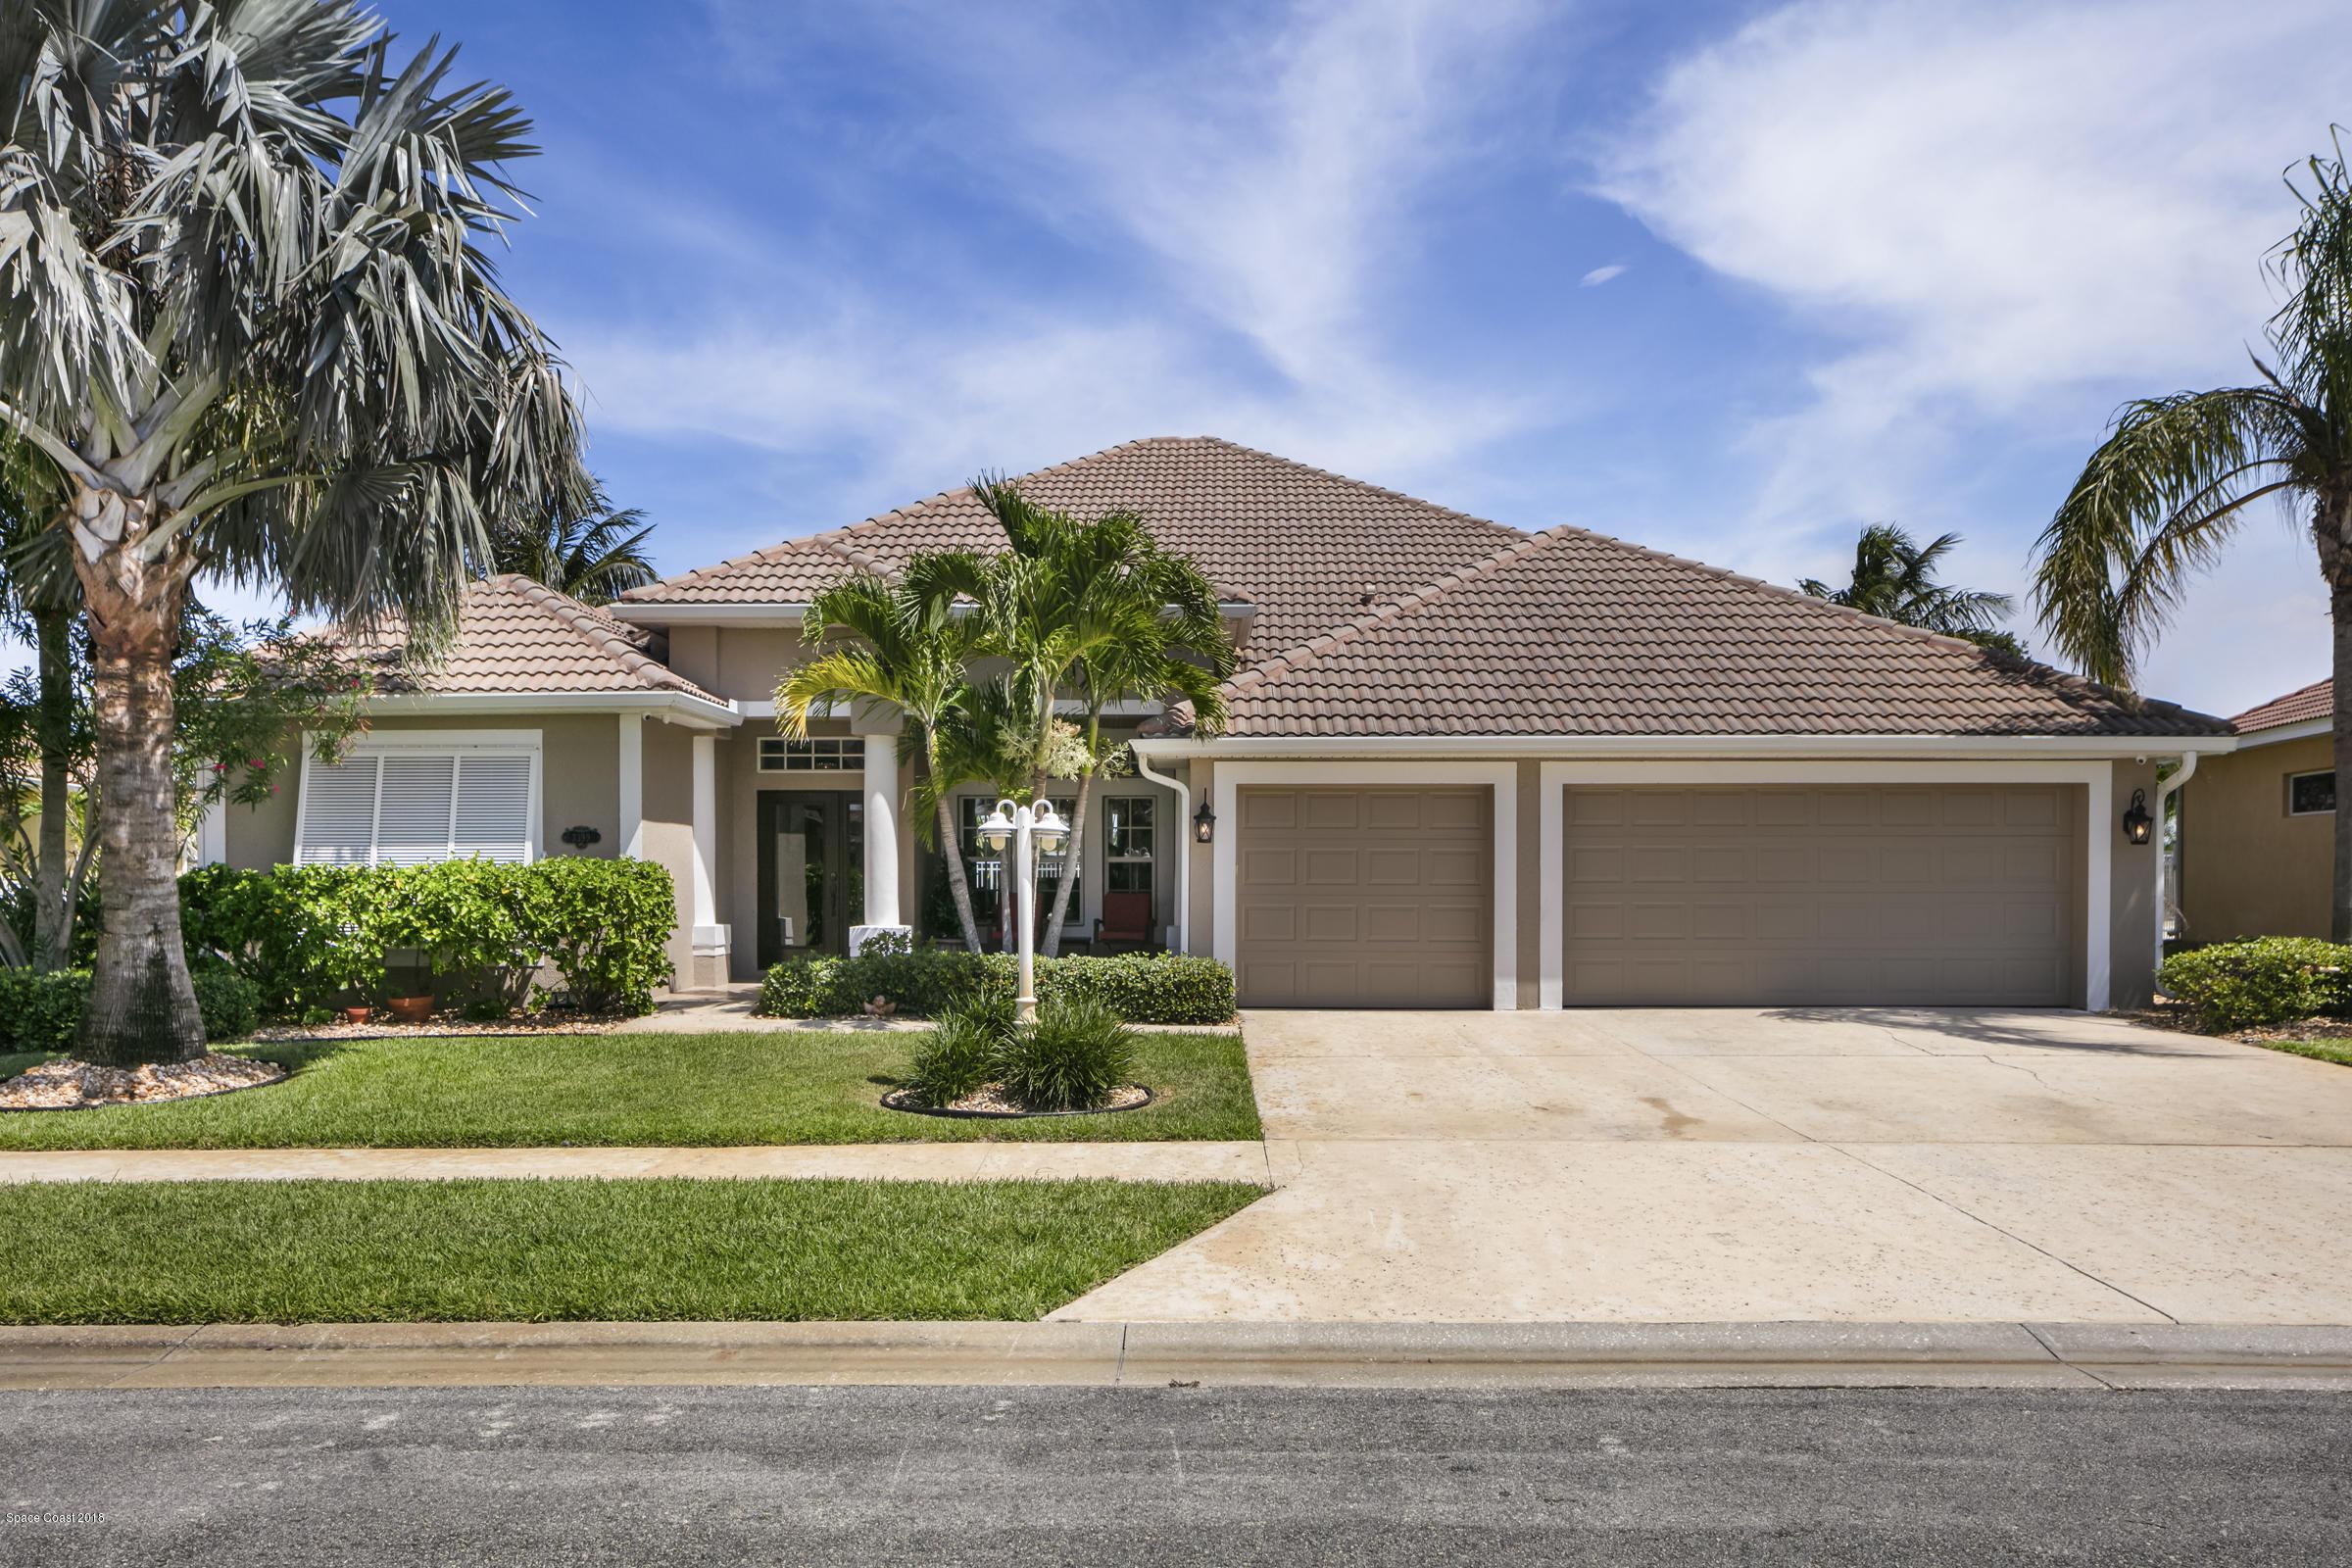 Single Family Home for Sale at 3399 Poseidon 3399 Poseidon Melbourne, Florida 32903 United States